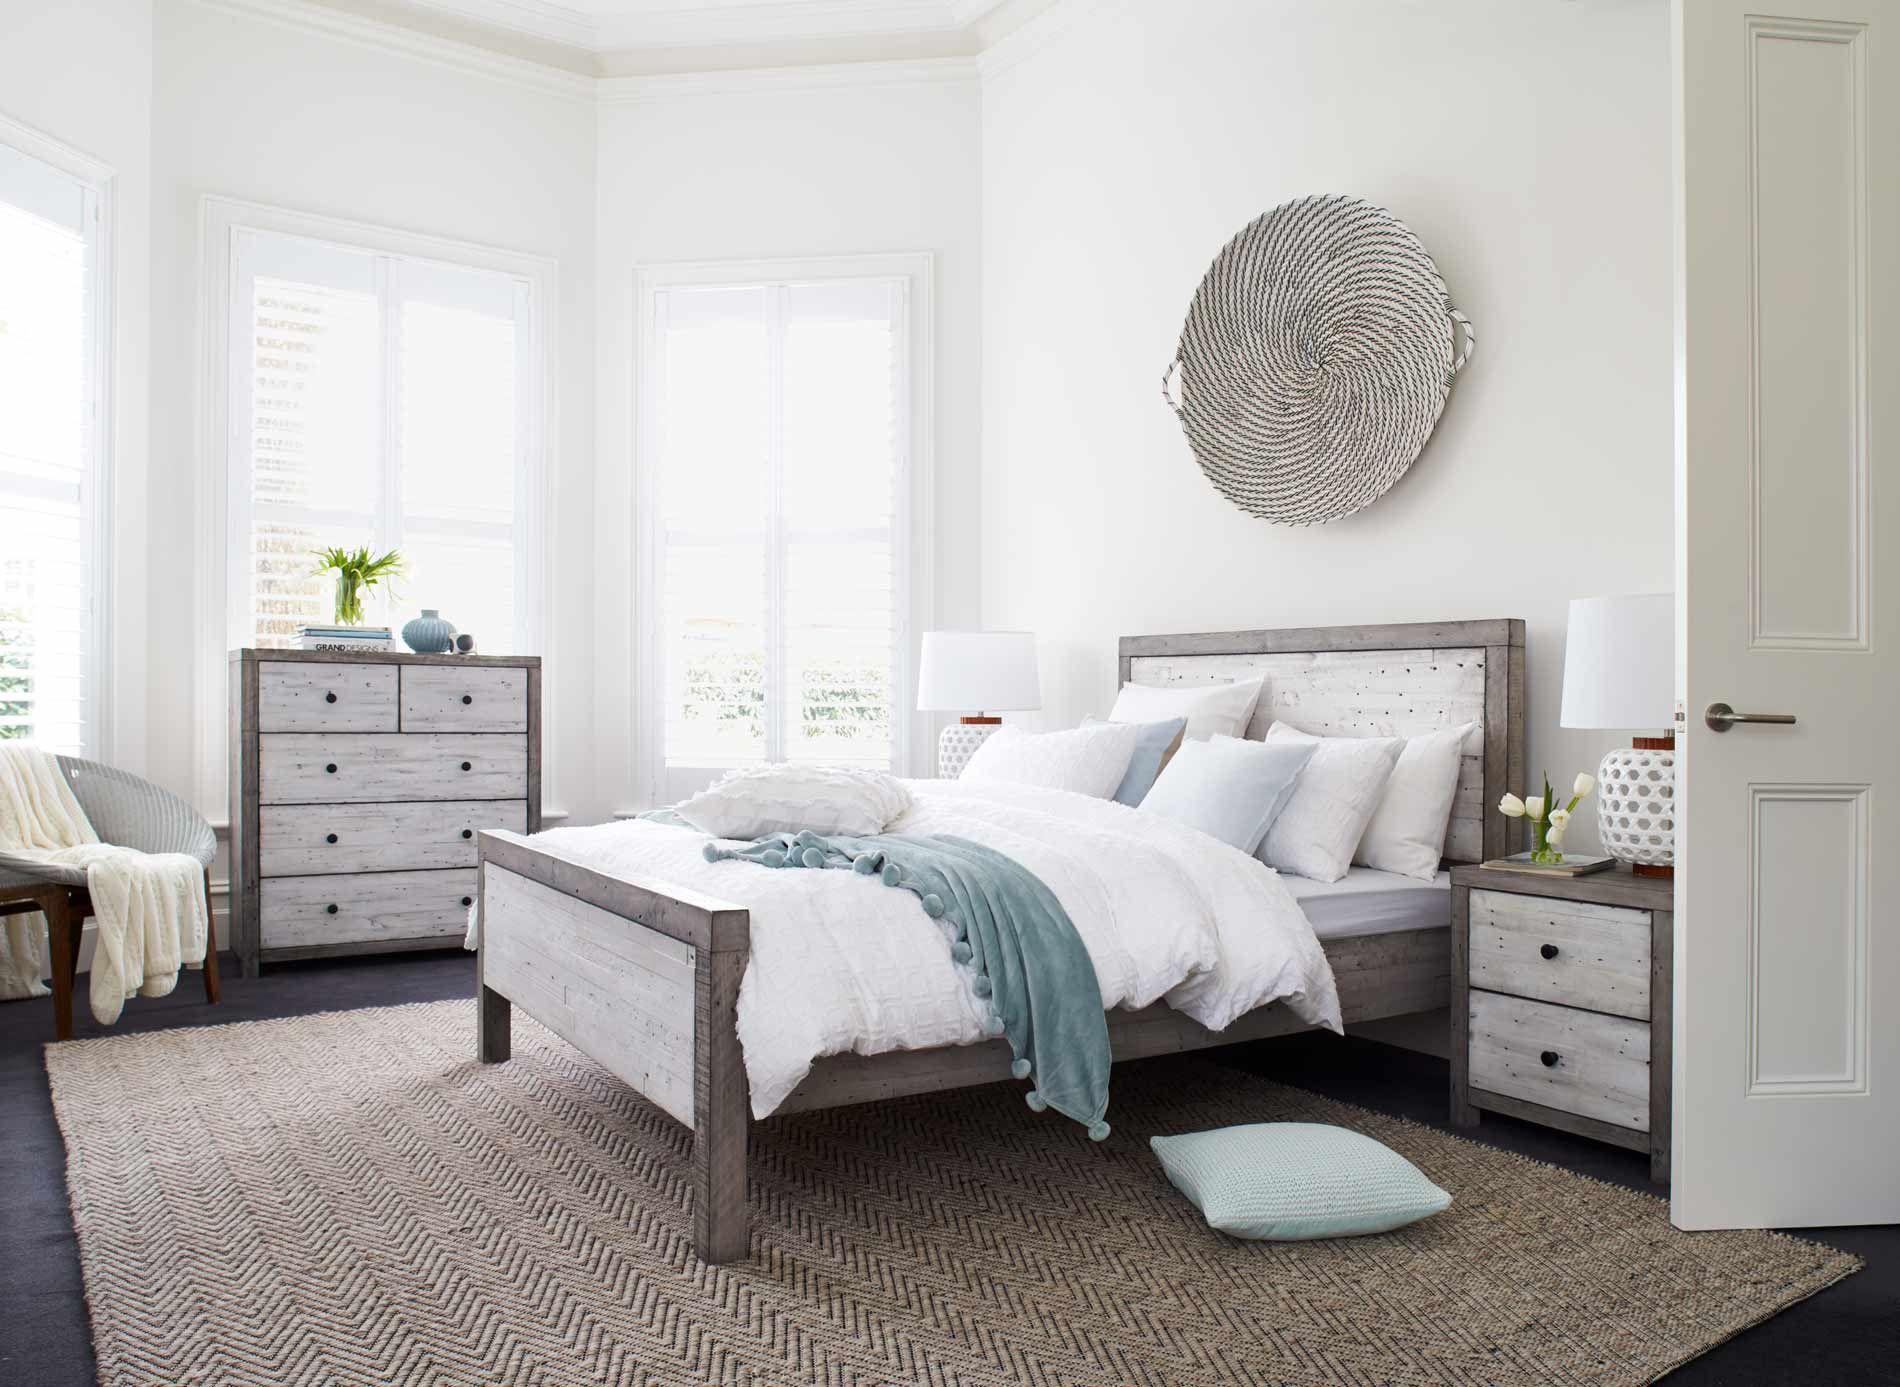 White Bedroom Tallboy Bedroomideas In 2020 Furniture Home Decor Styles Interior Design Bedroom